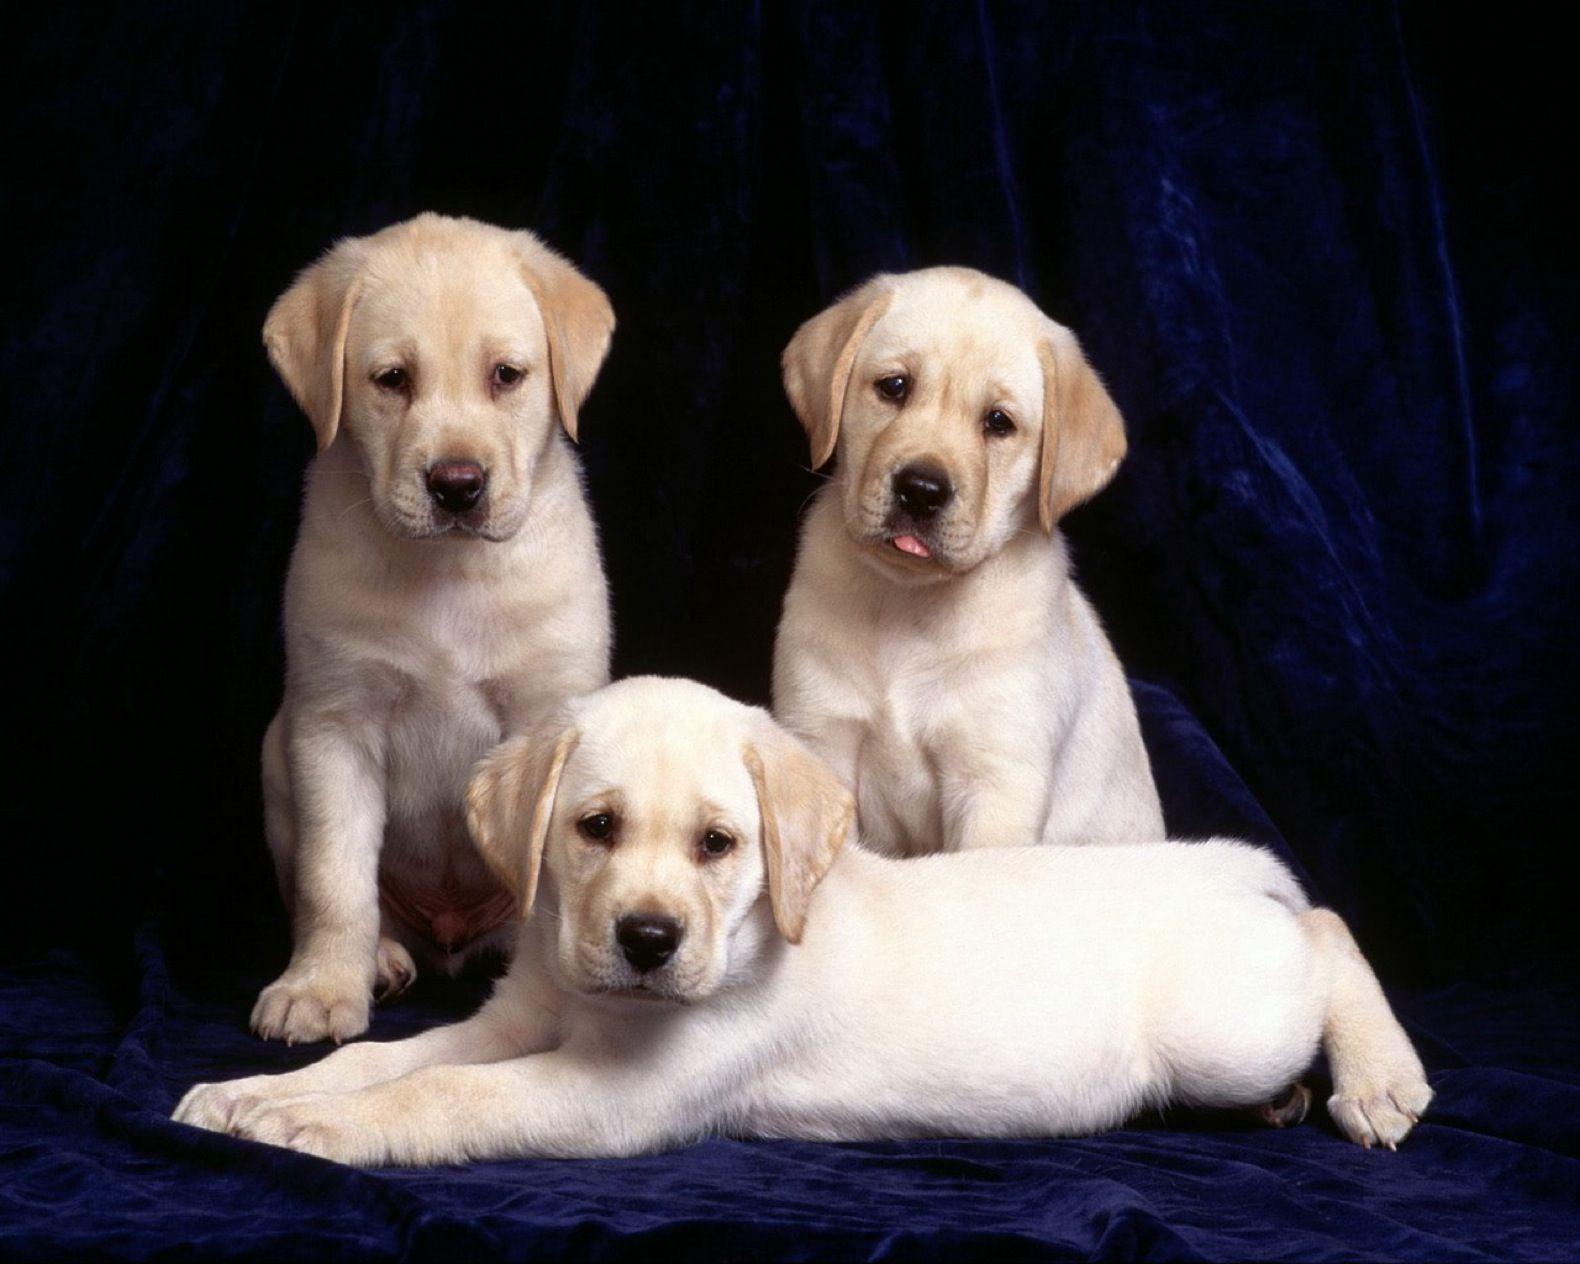 Dog Computer Wallpapers Desktop Backgrounds 1580x1264 Id 49359 Labrador Retriever Dog Adoption Dogs